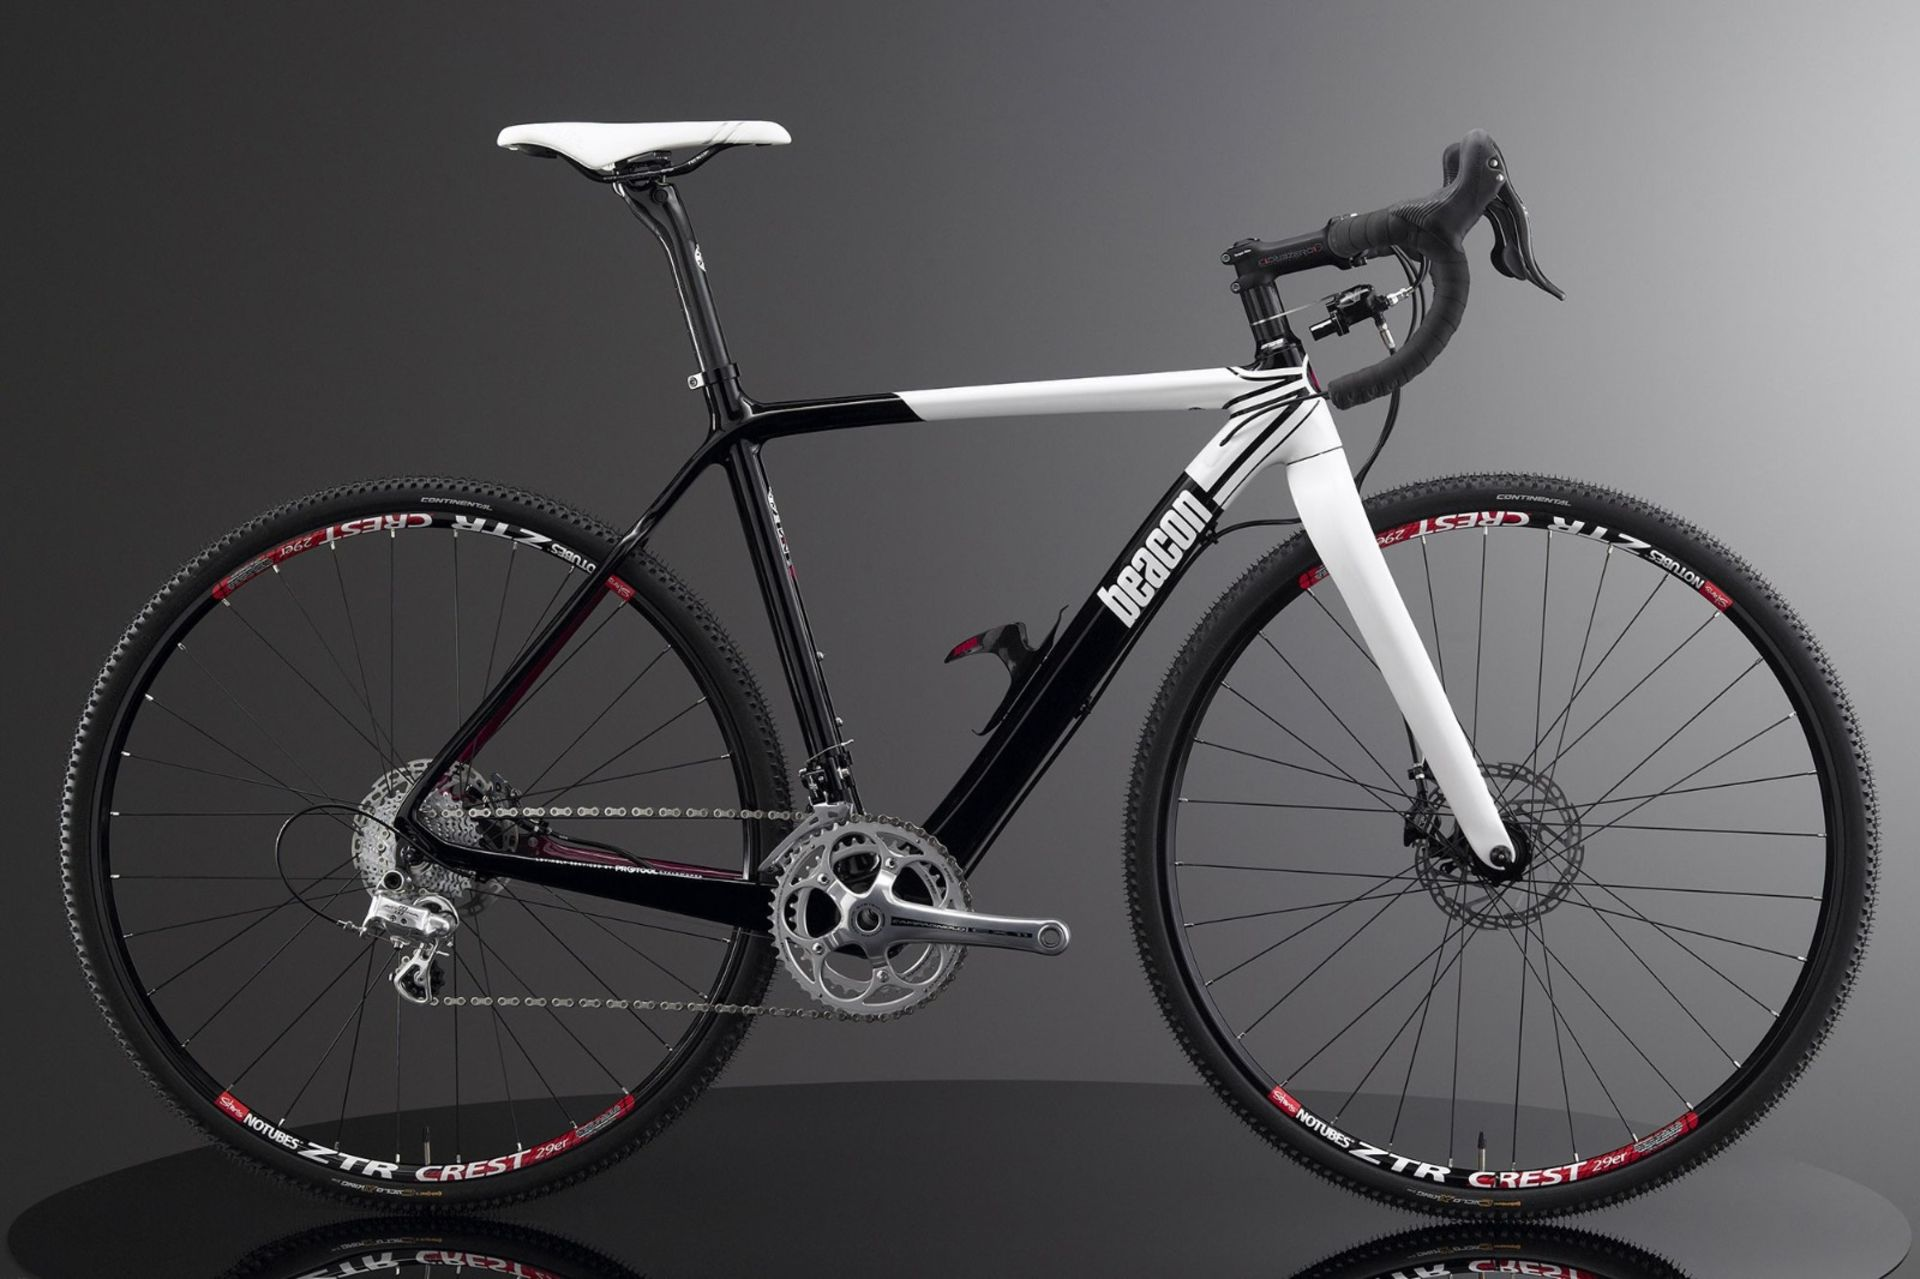 Lot 14 - 1 x Beacon Model BF-45, Size 540, Carbon Fibre Bike Frame in Black & White.